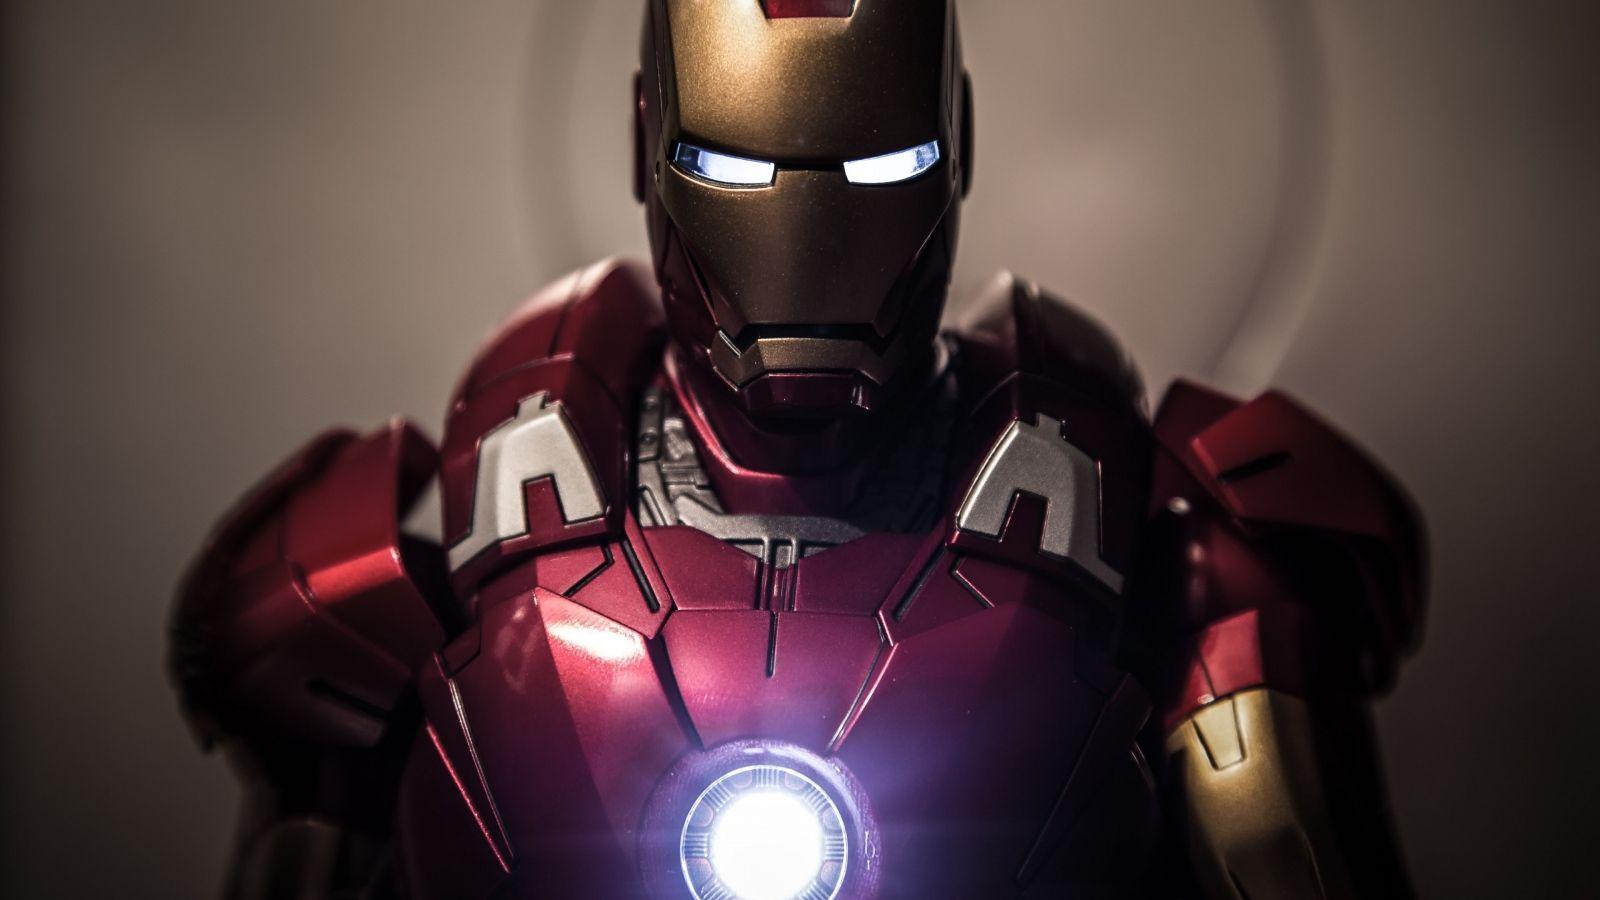 1600x900 Wallpaper Iron Man Tony Stark Superhero